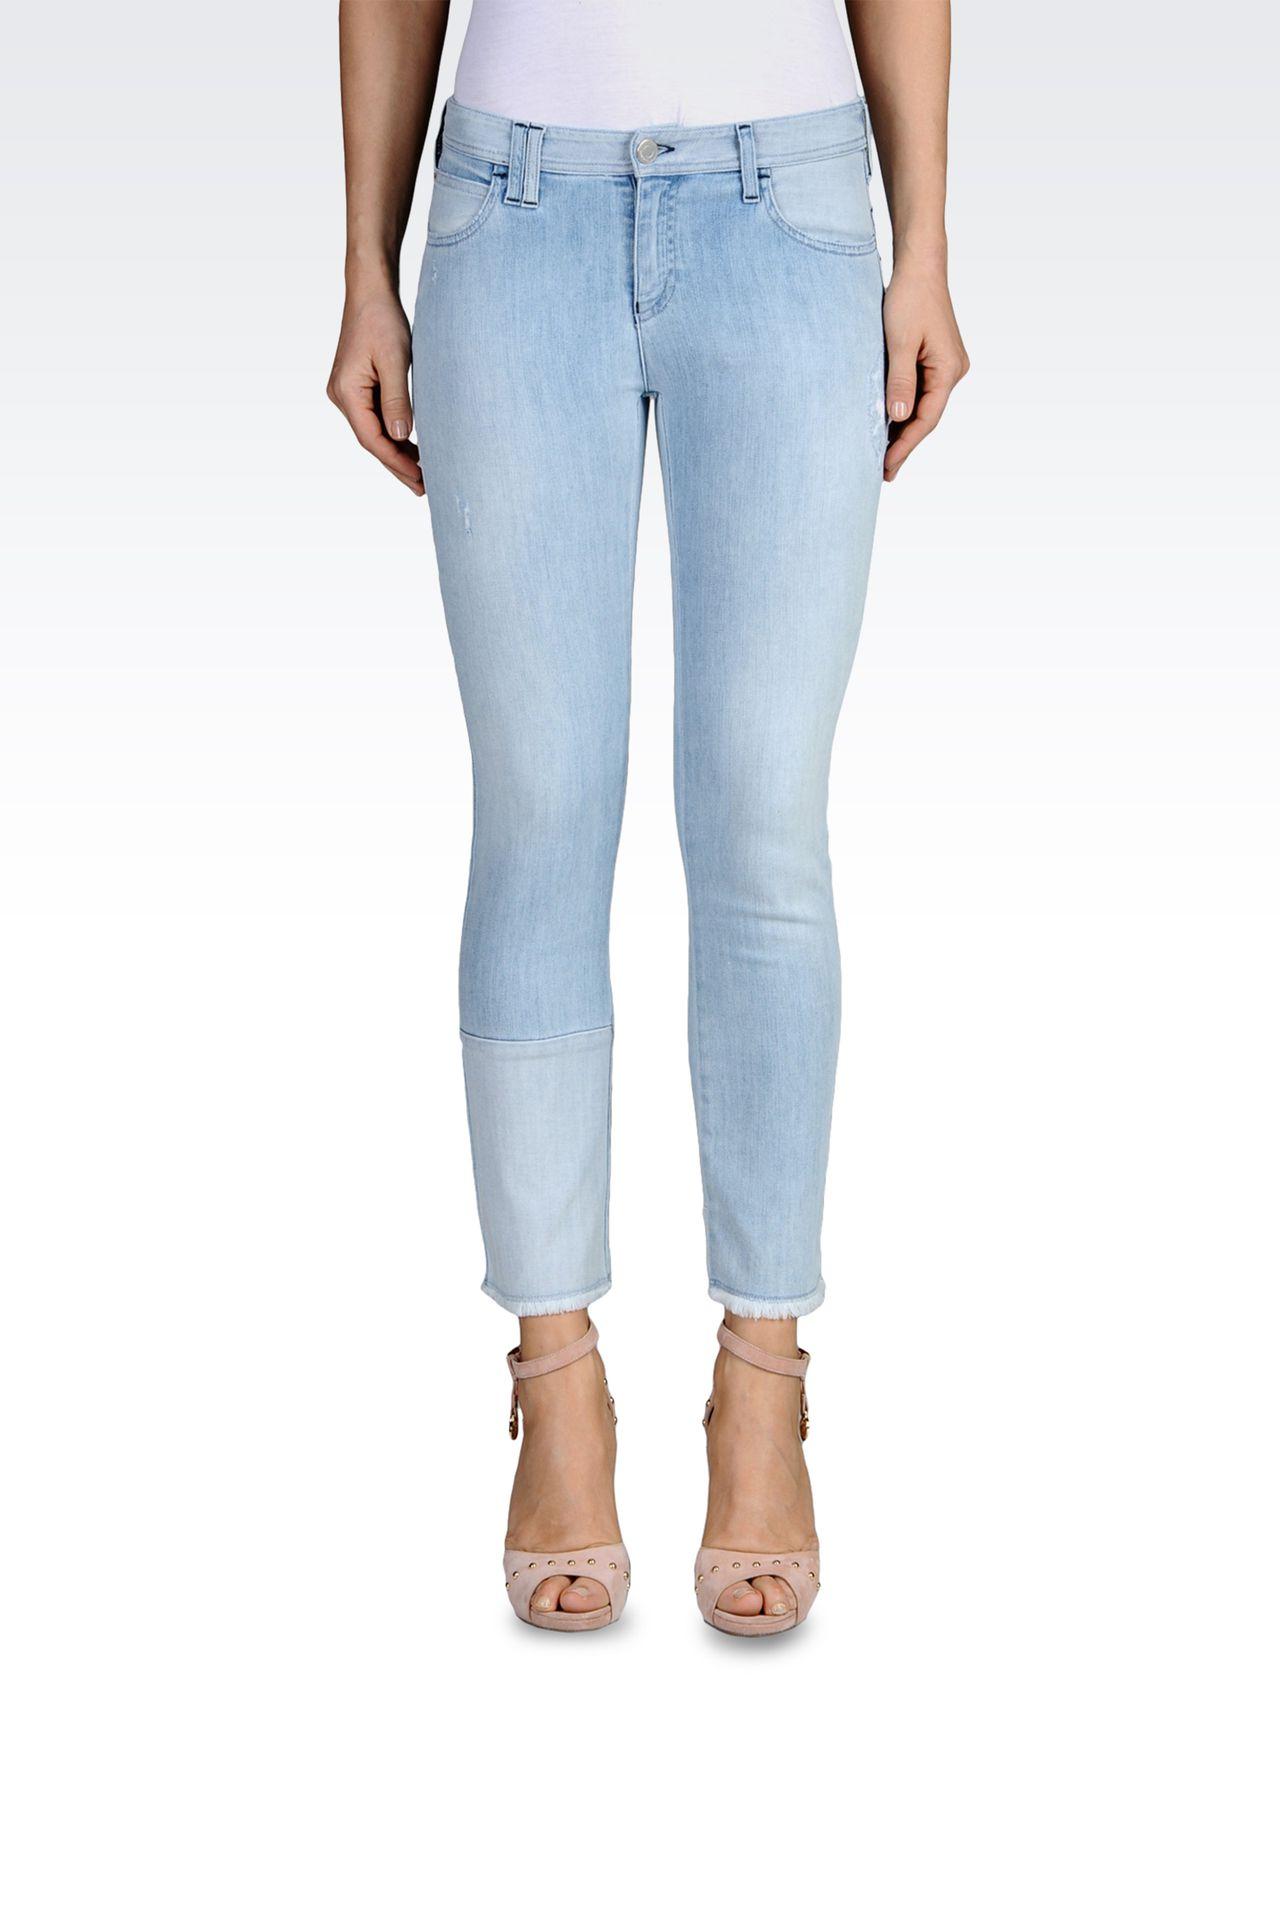 Ripped Jeans for Men: Destroyed Jeans Nordstrom